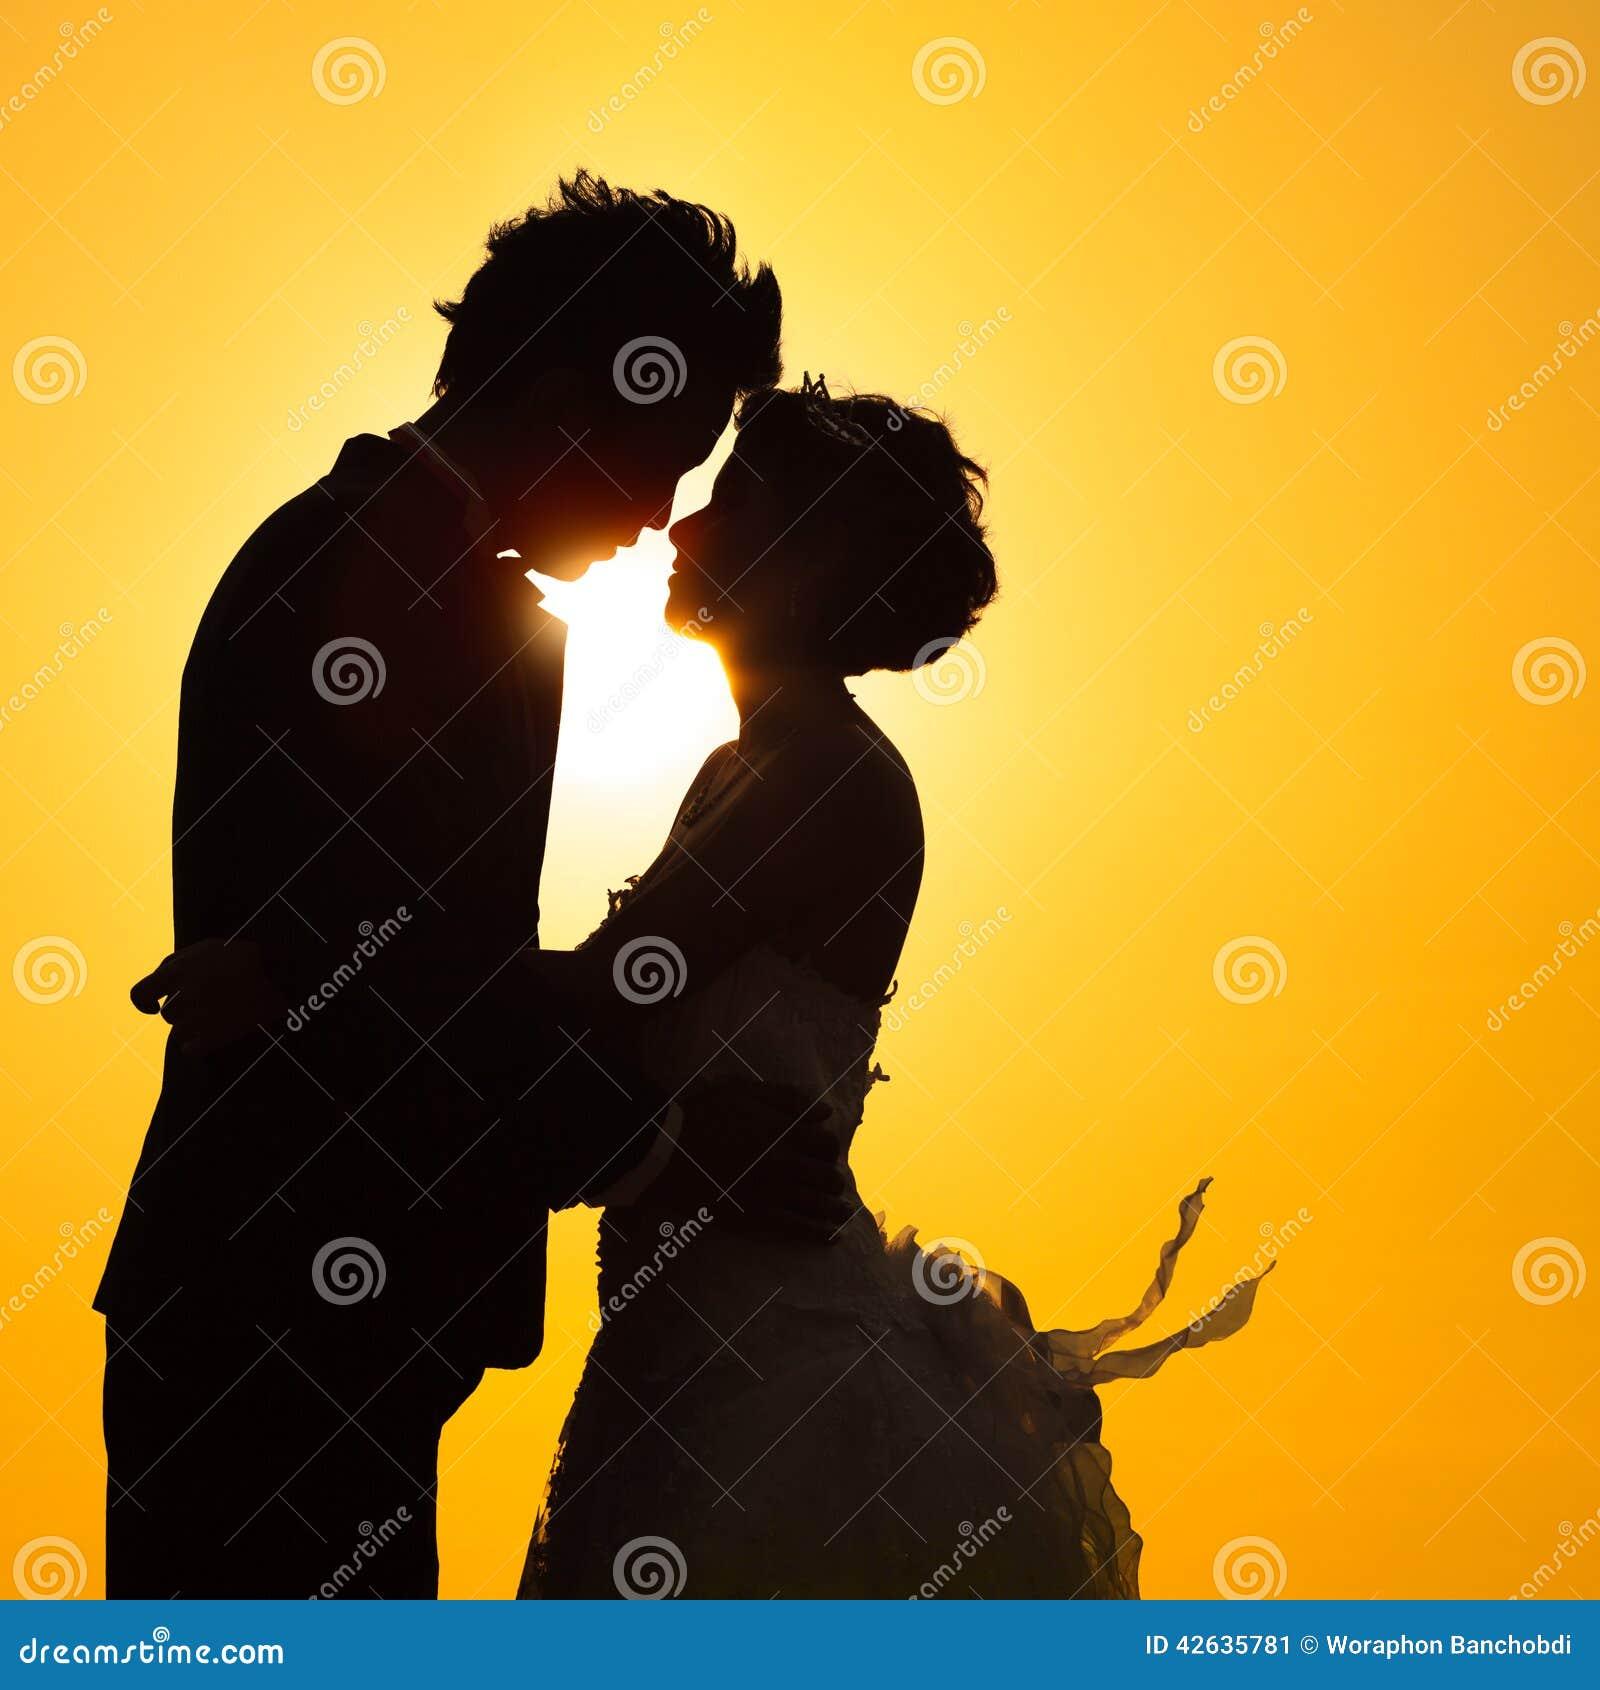 Silhouette Couple Love Stock Image. Image Of Beach, Love